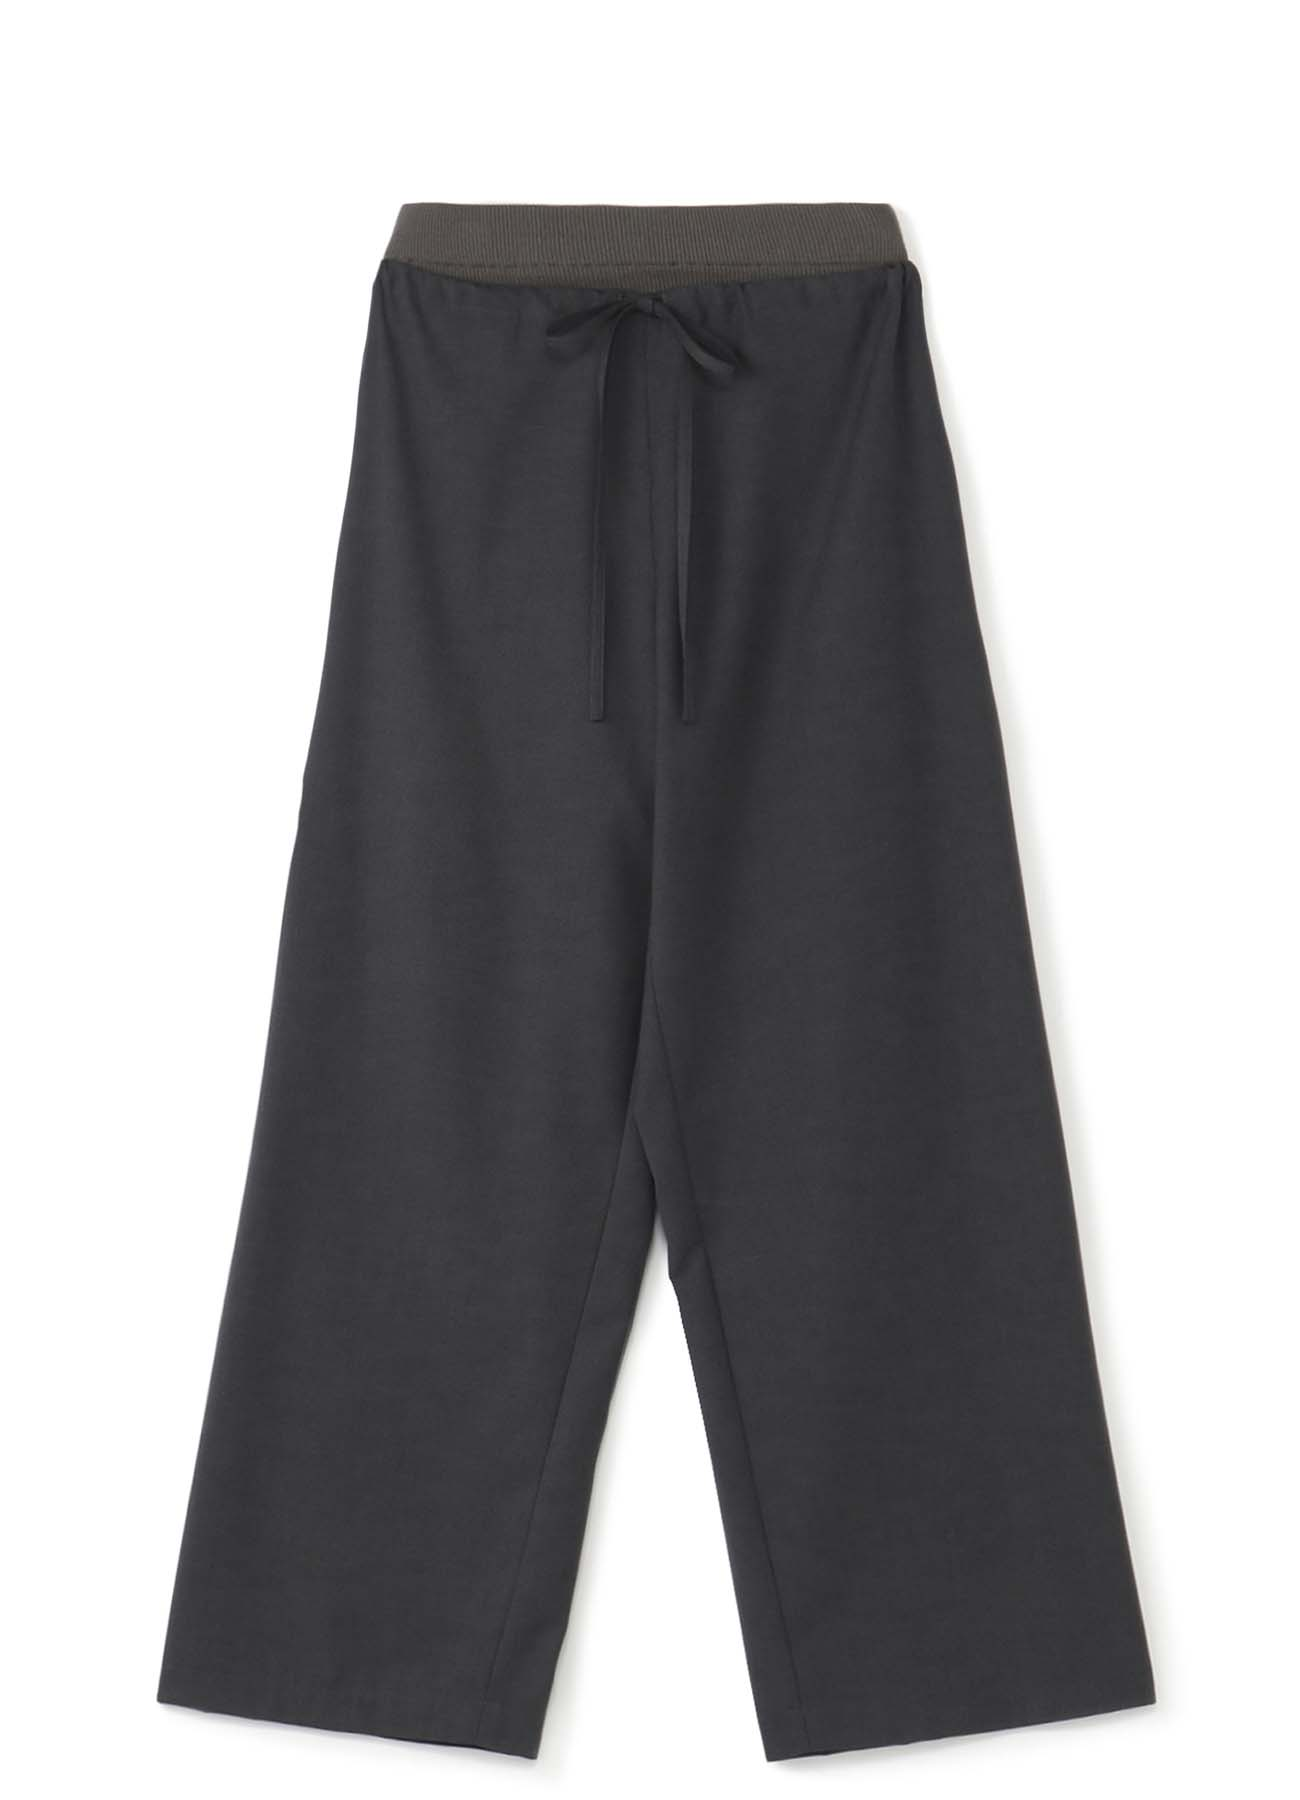 RISMATby Y's涤纶人造丝透明斜纹腰围罗纹宽裤